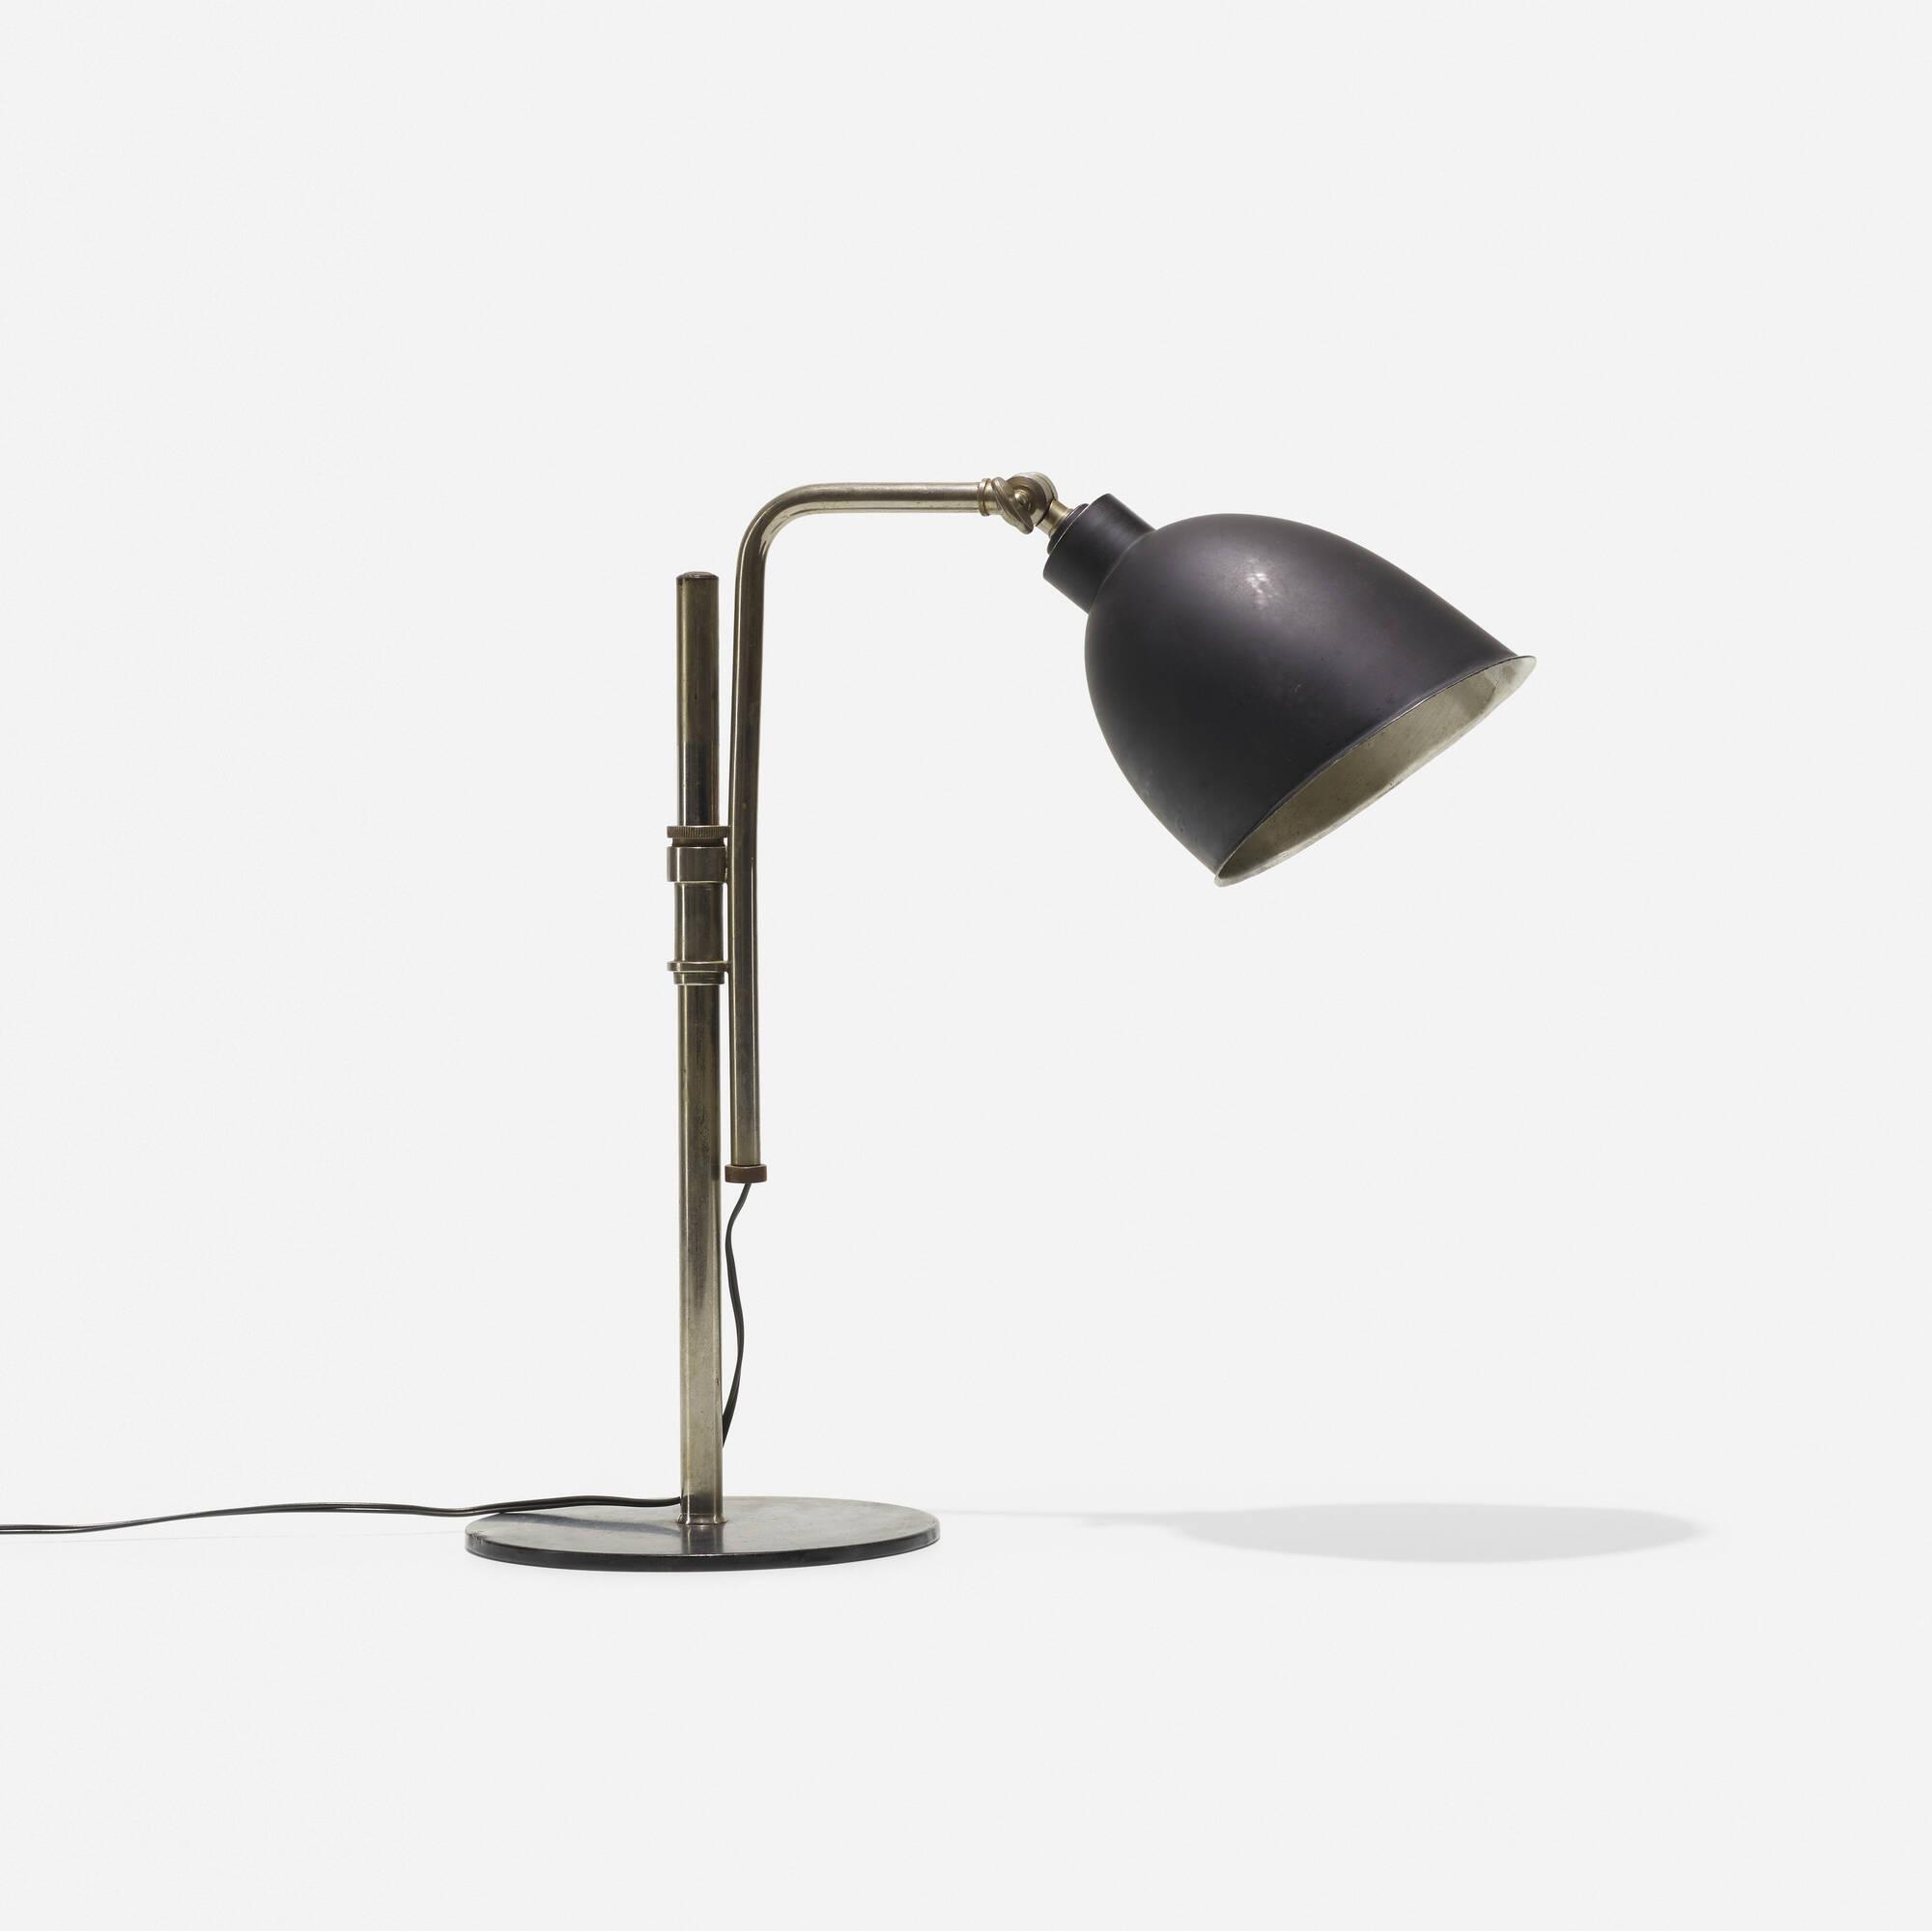 314: Christian Dell / Rondella table lamp (1 of 2)